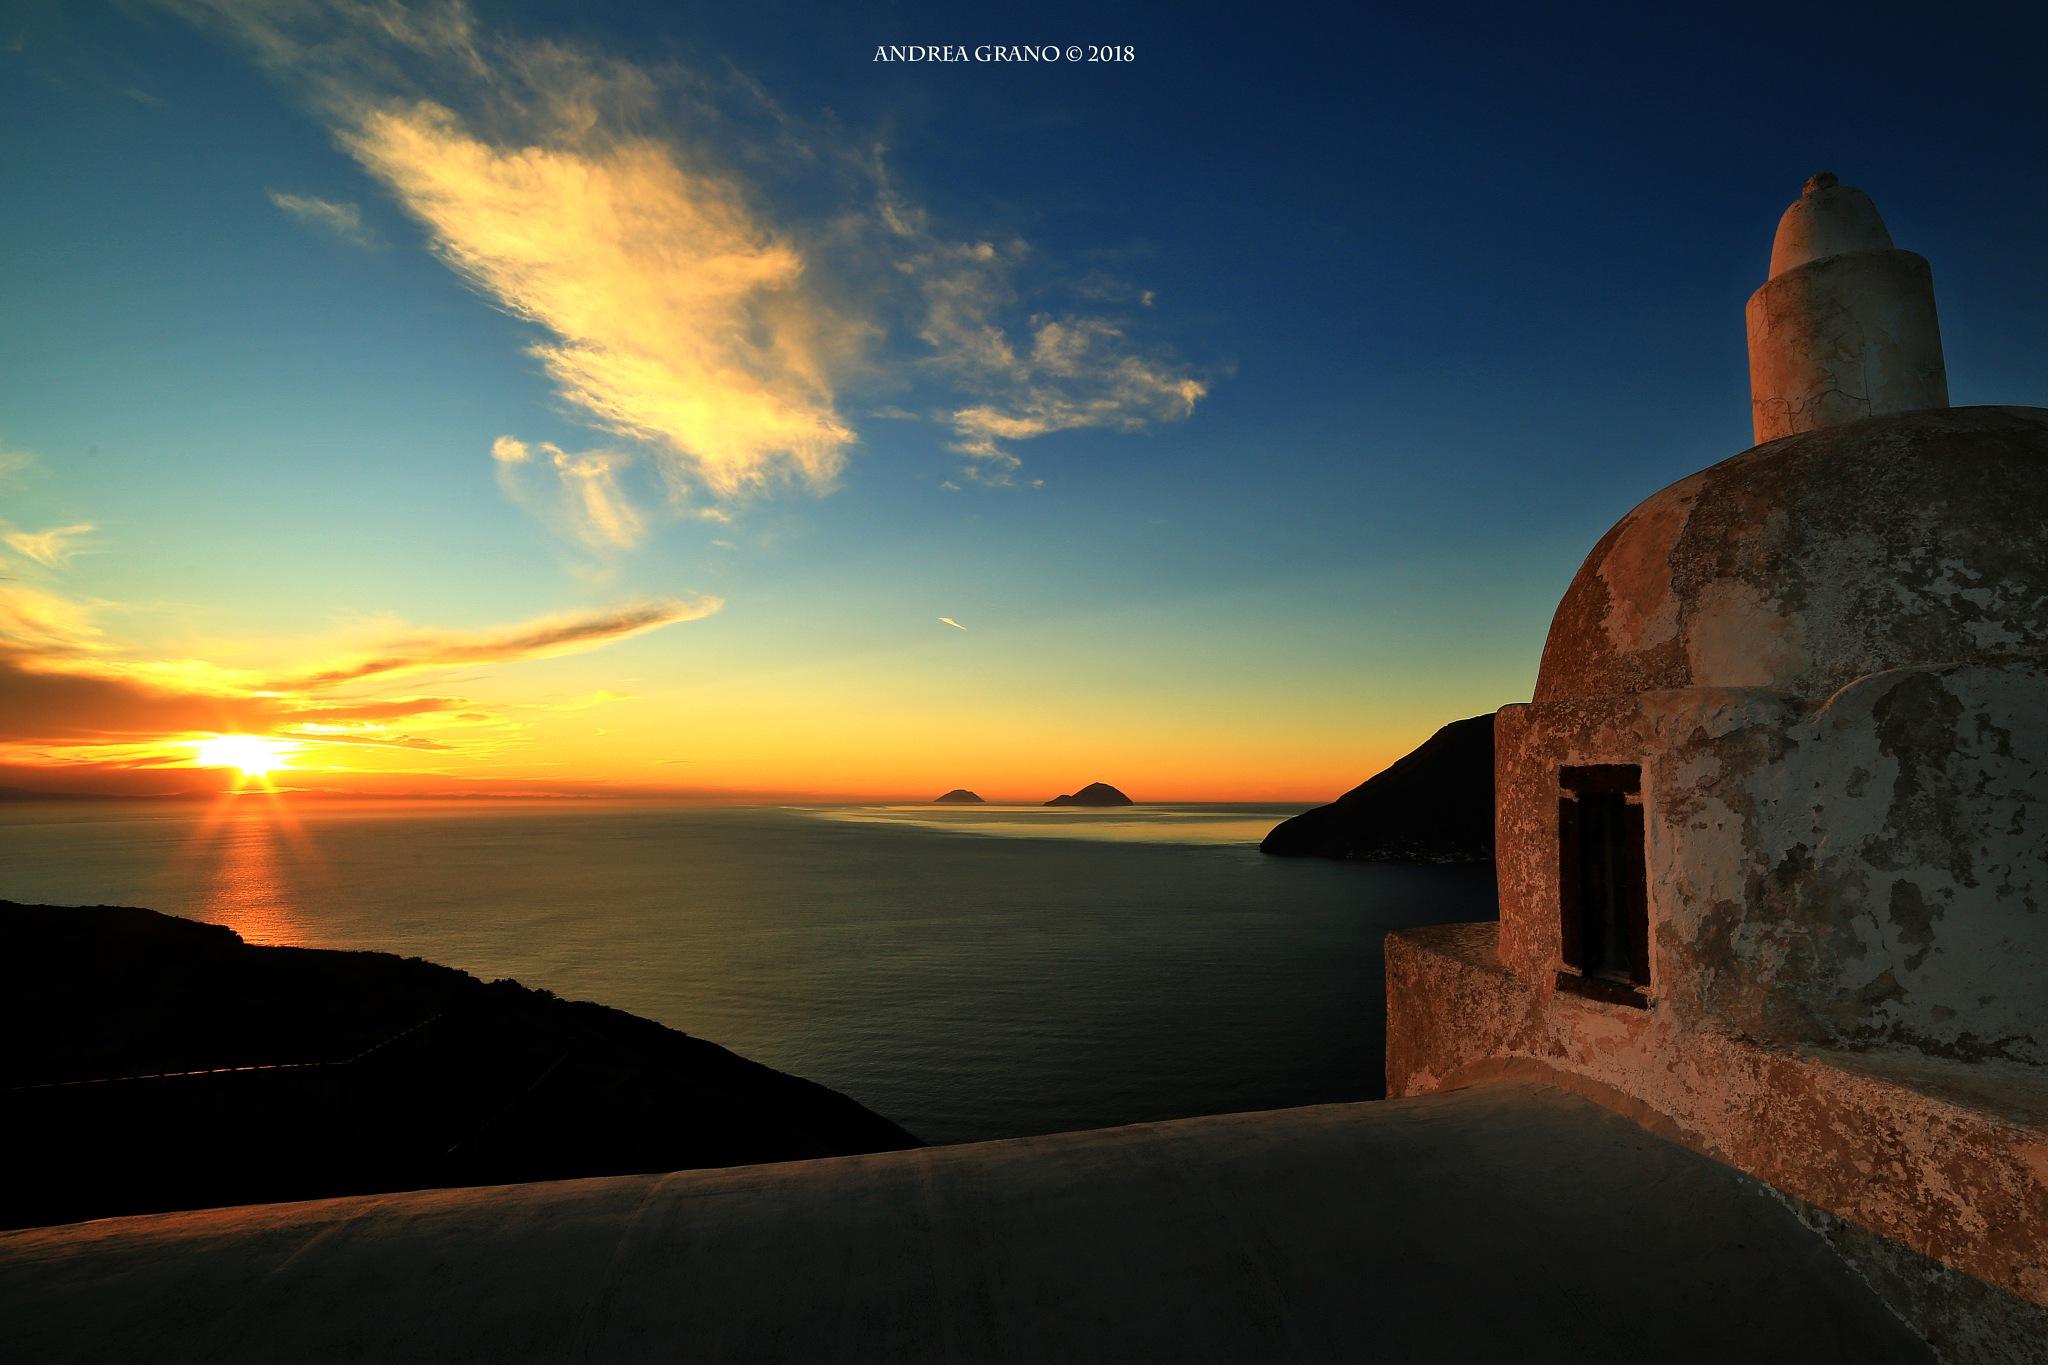 Aeolian Sunset by Andrea Grano